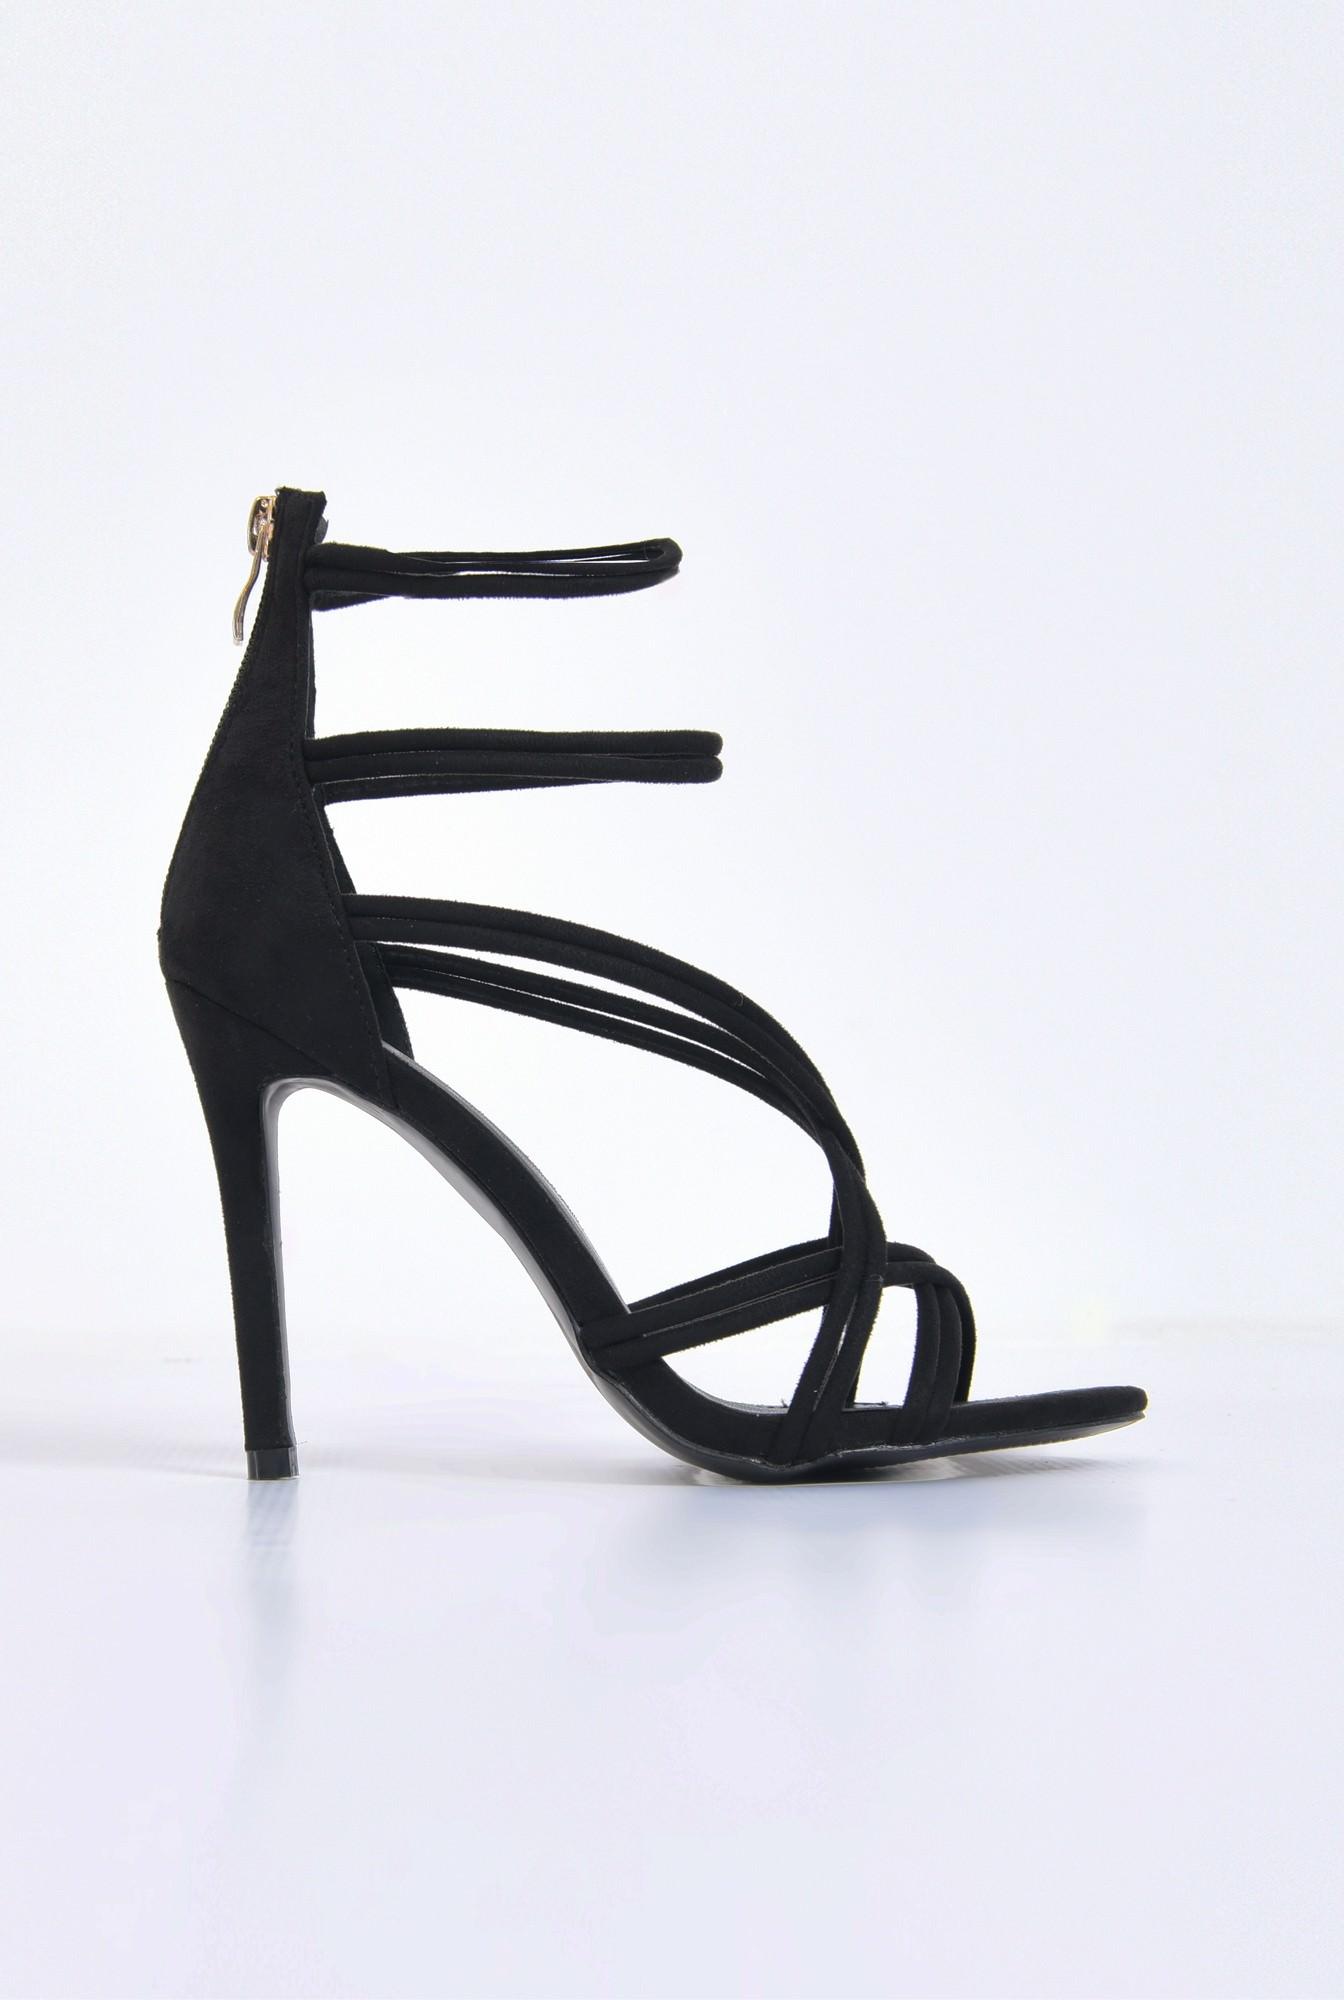 sandale elegante, negre, catifea, stiletto